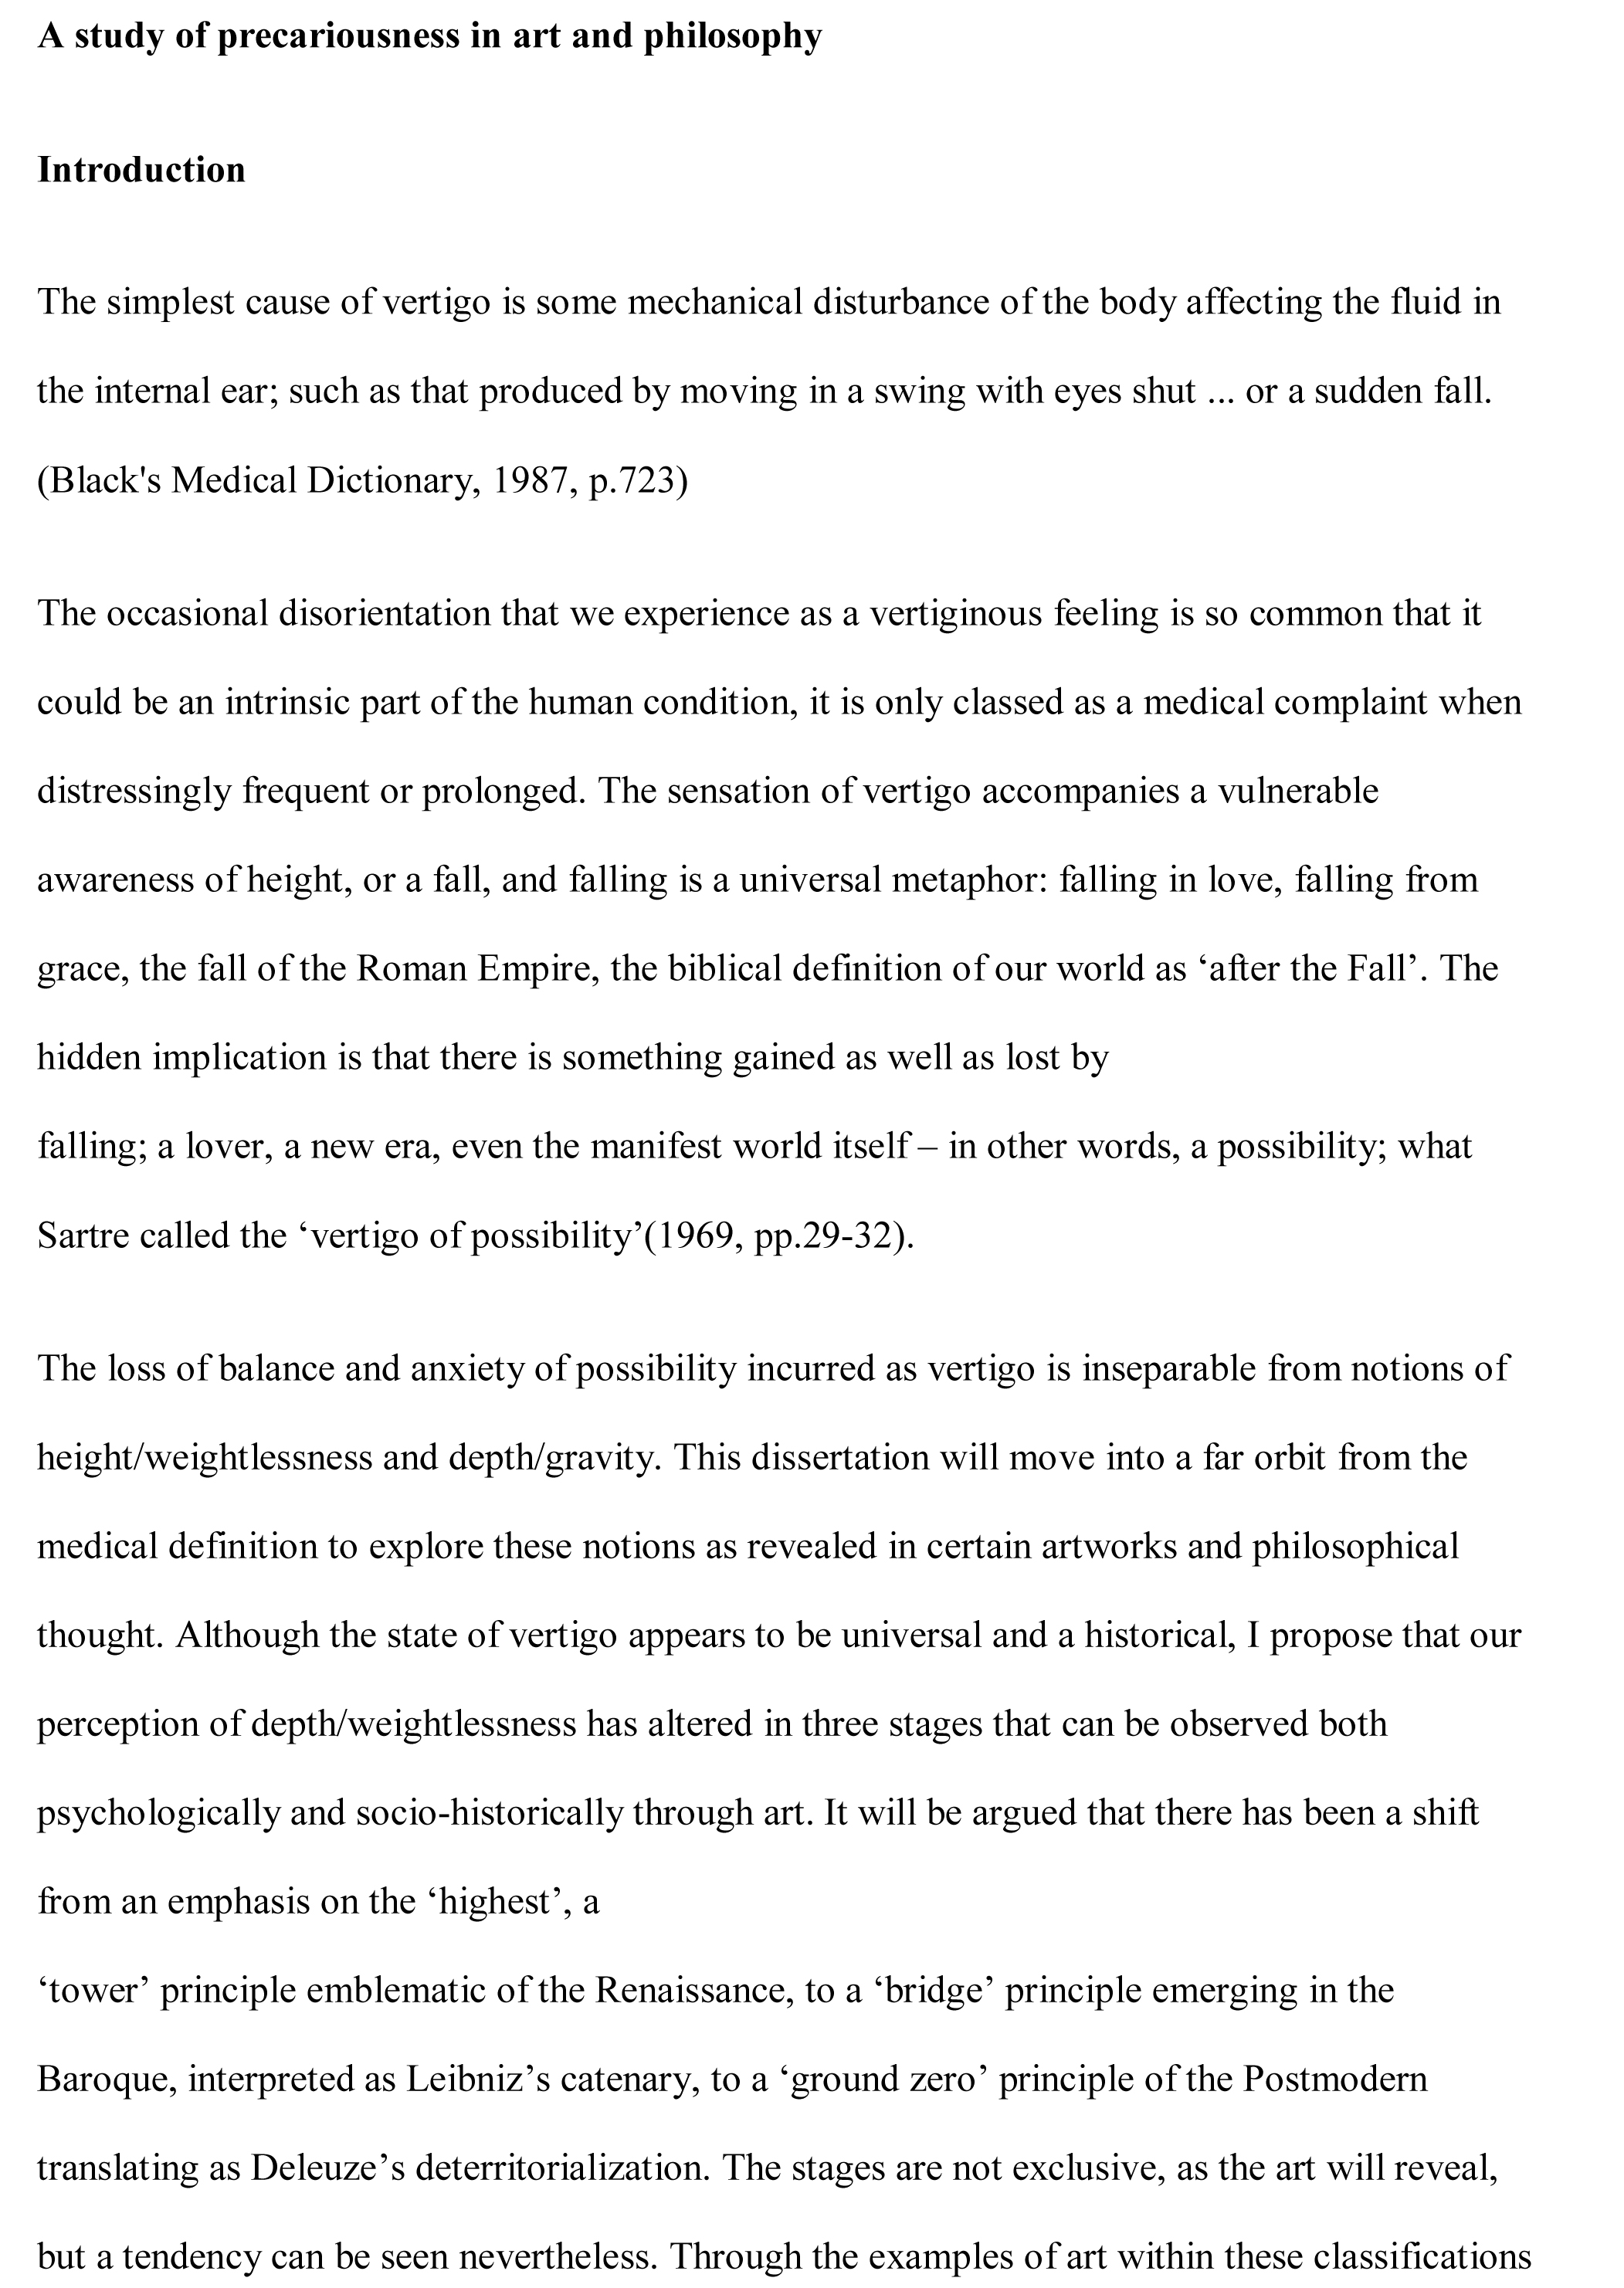 017 Essay Example Sample Act Essays Art Coursework Wonderful New Writing Full